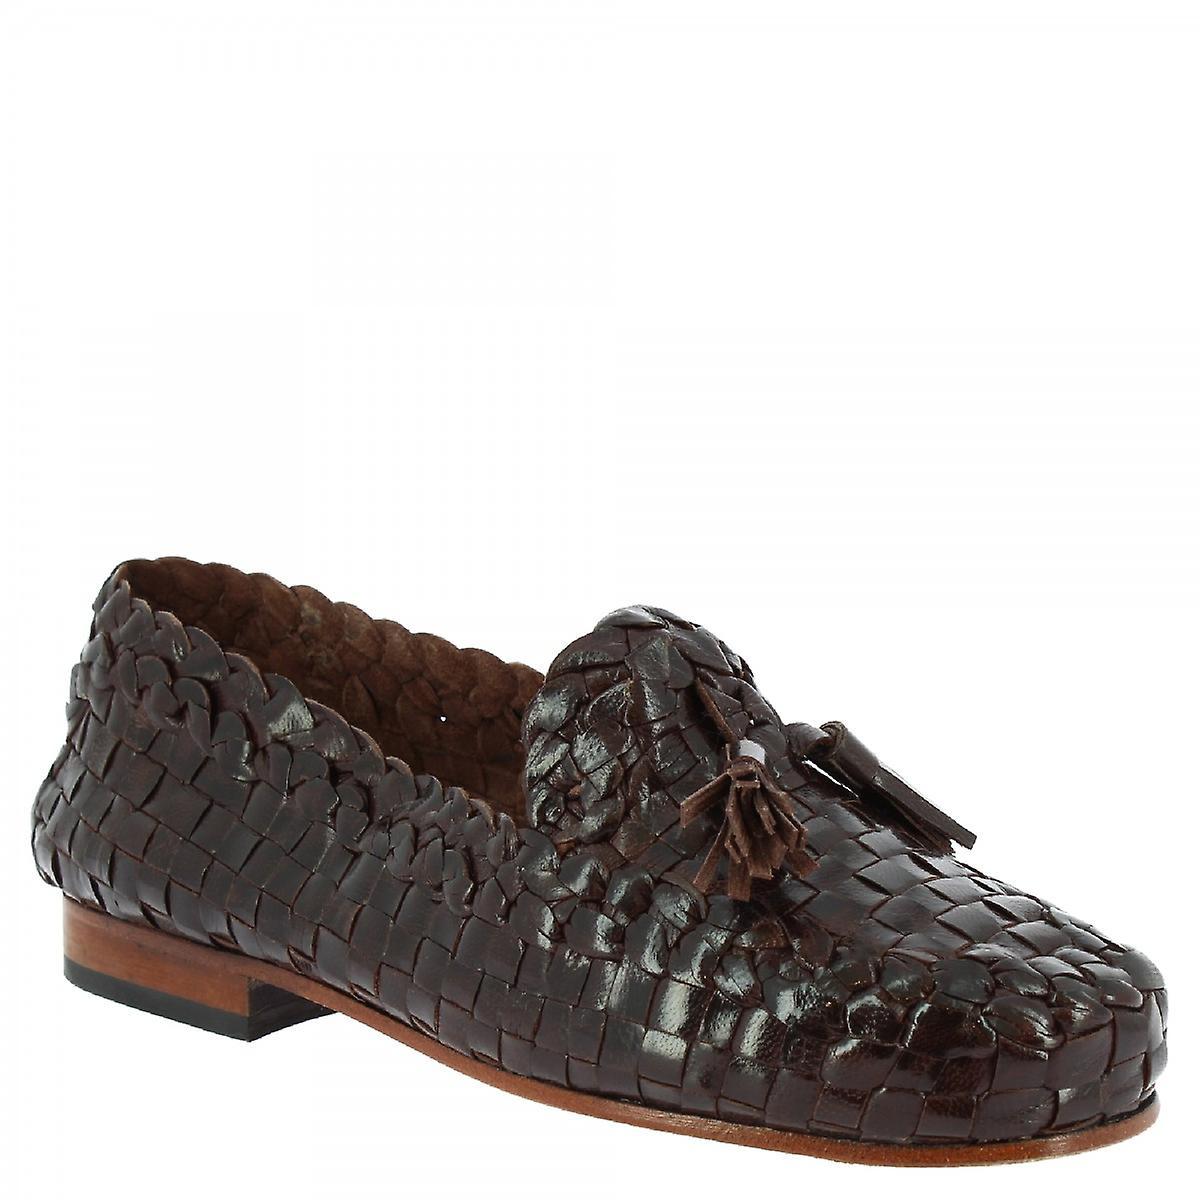 Leonardo Shoes Women's handmade tassels loafers dark brown woven calf leather u0SBP